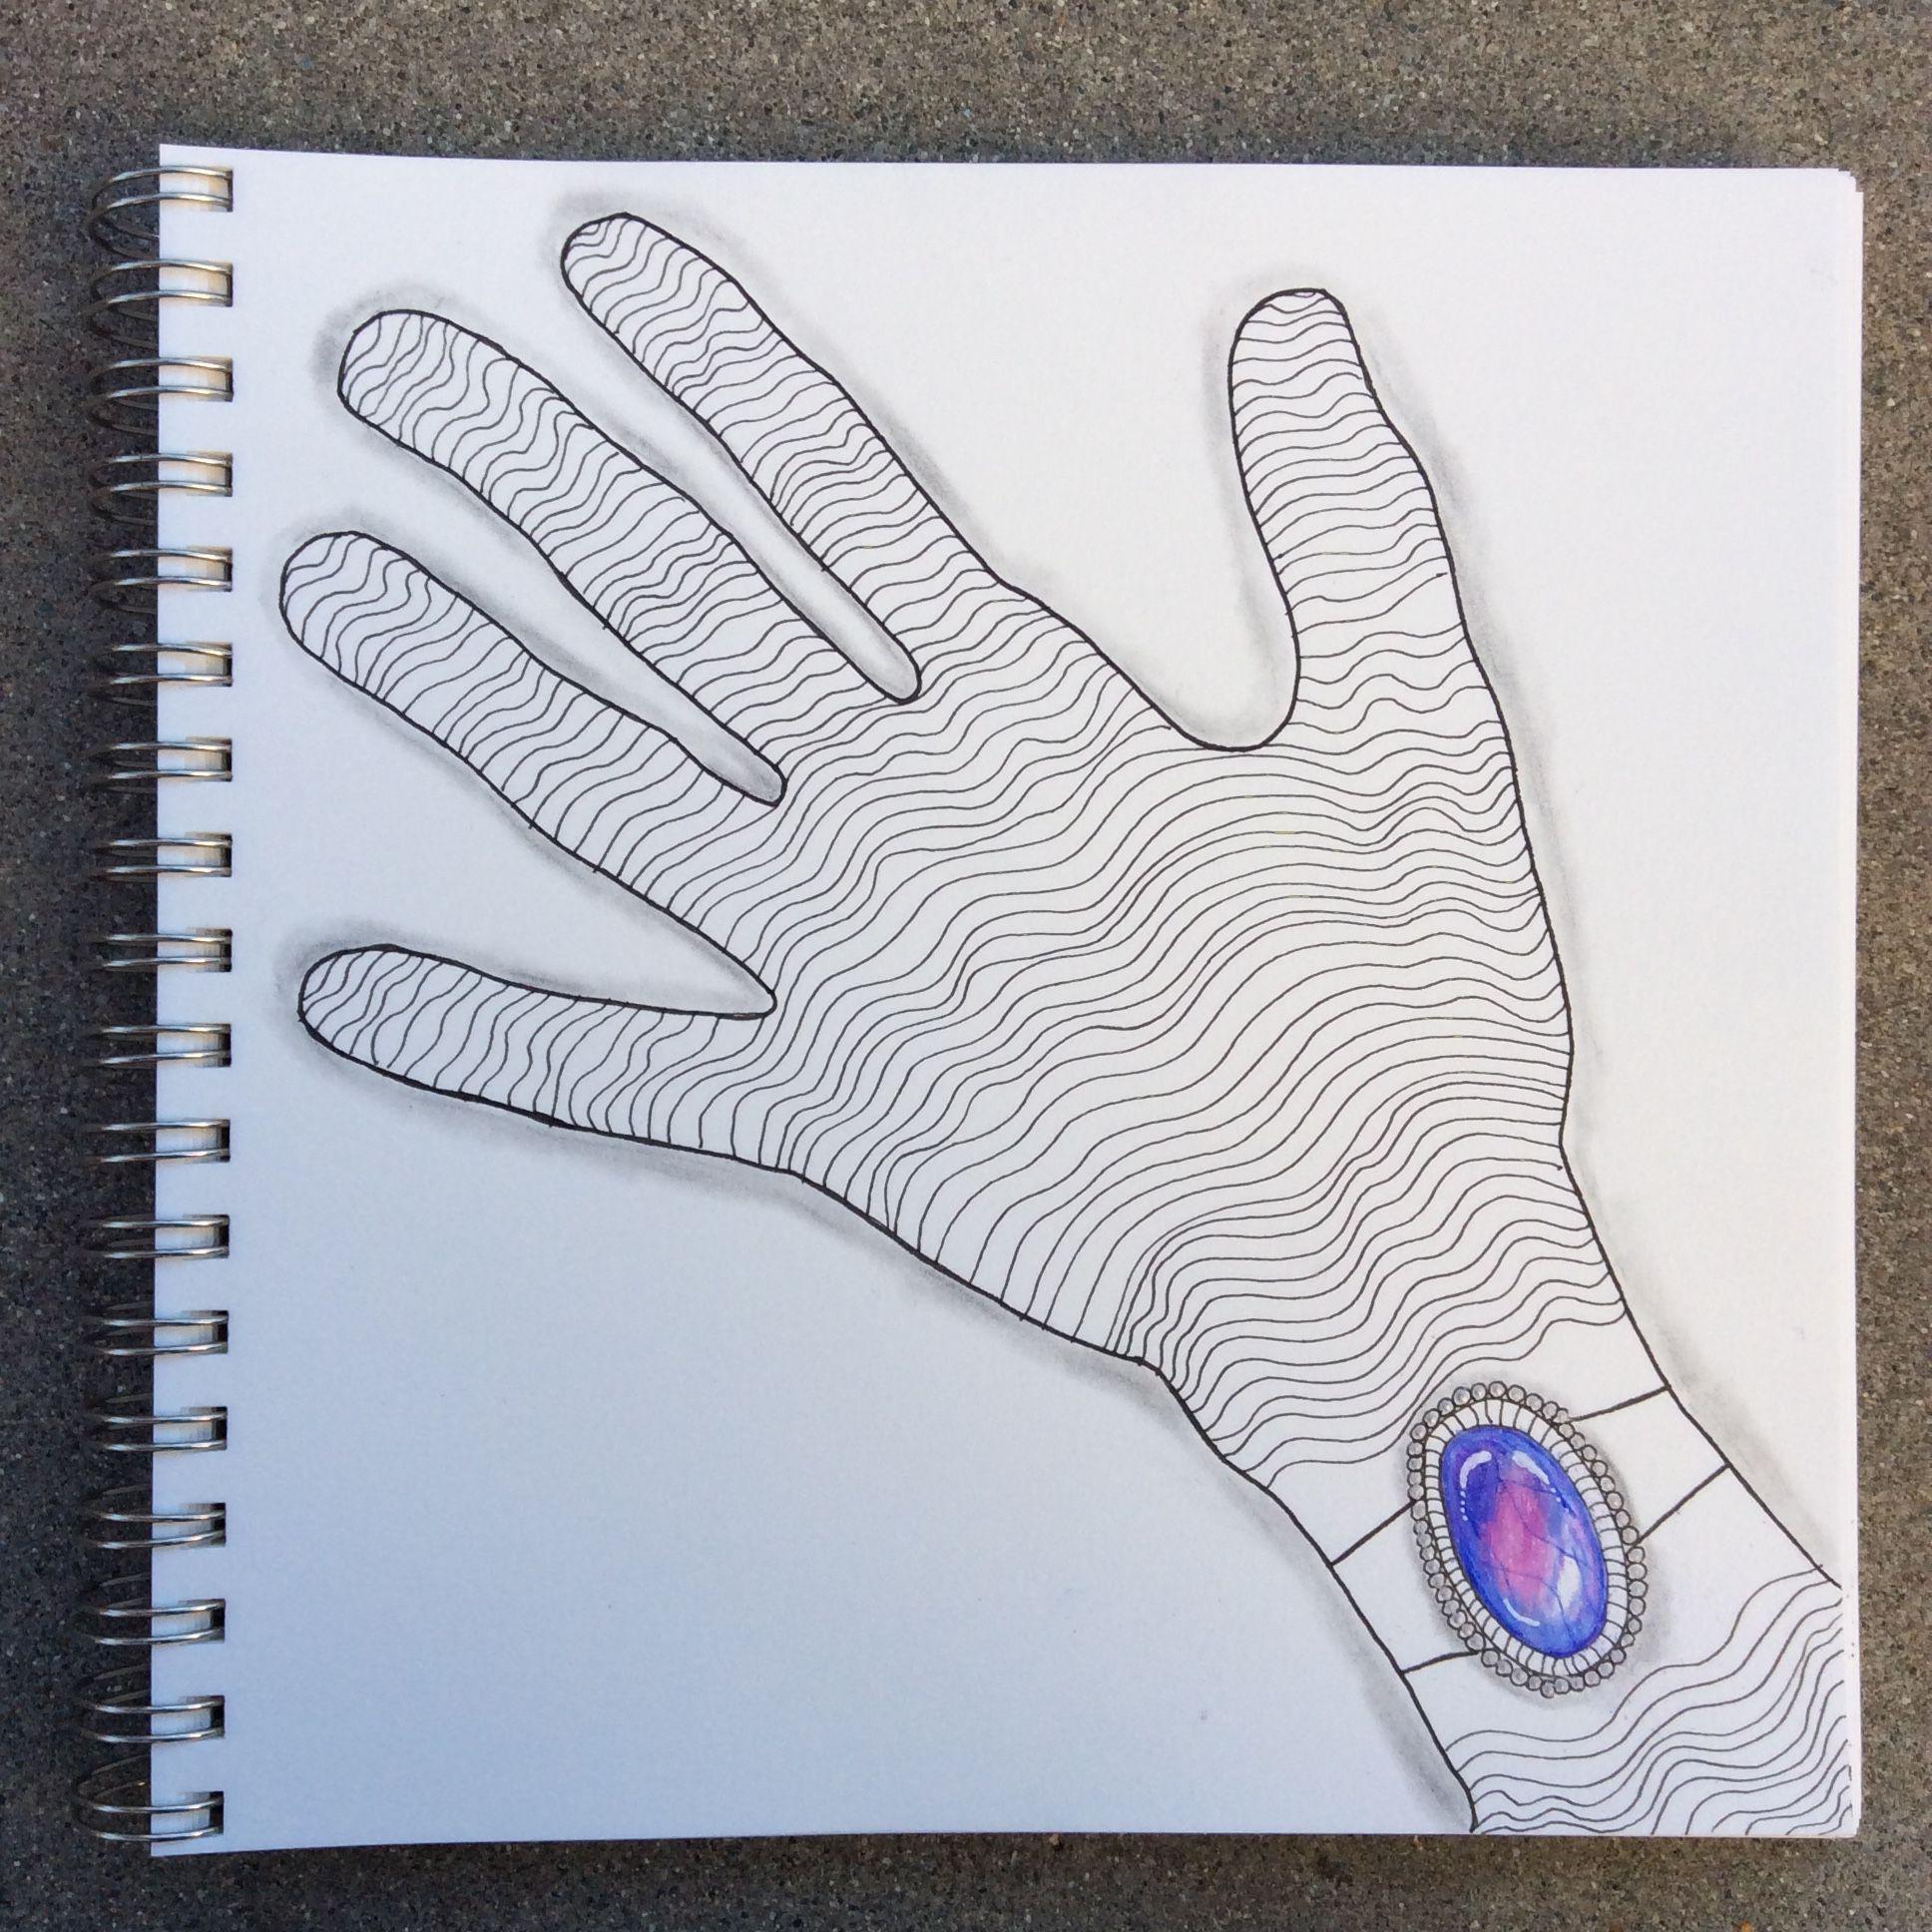 Zentangle gem bracelet and line art of hand by czt nancy domnauer